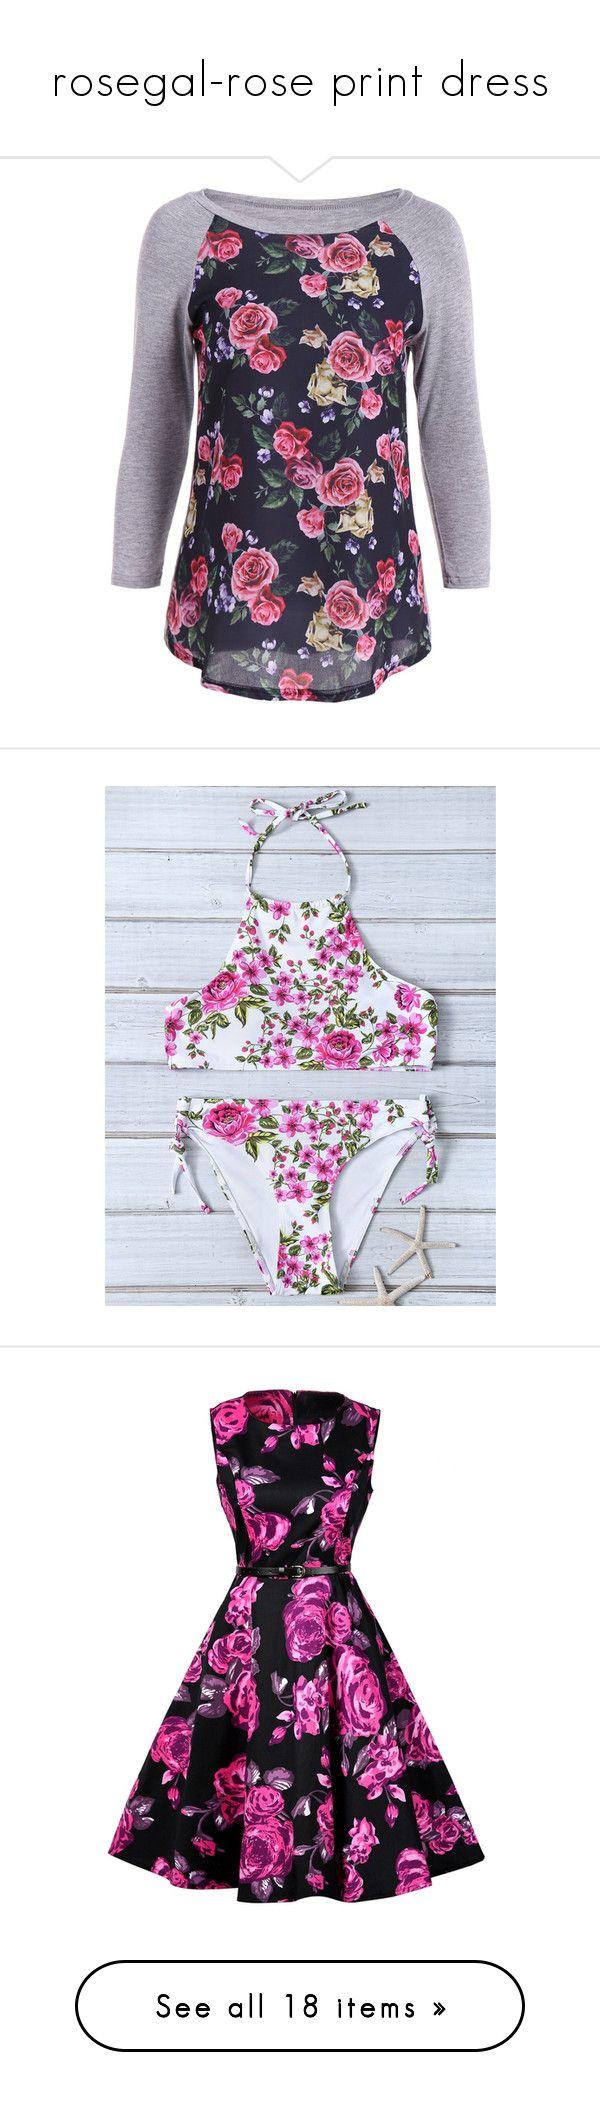 """rosegal-rose print dress"" by fshionme ❤ liked on Polyvore featuring tops, t-shirts, raglan sleeve tee, blue tee, floral print tops, floral print t shirt, raglan top, swimwear, bikinis and bikini swimwear"